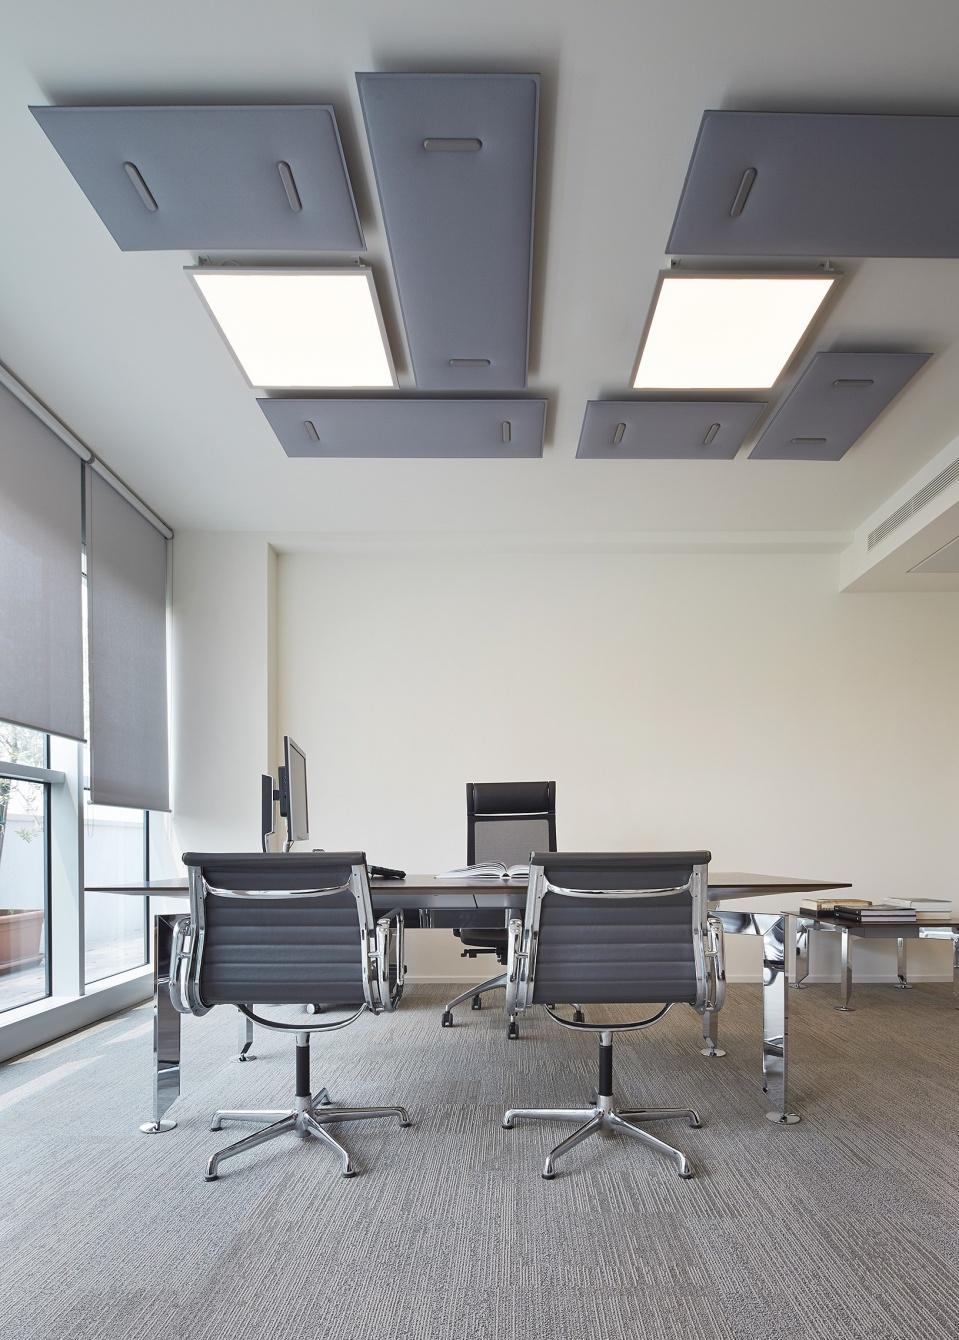 mitesco-ceiling-application-1.jpg